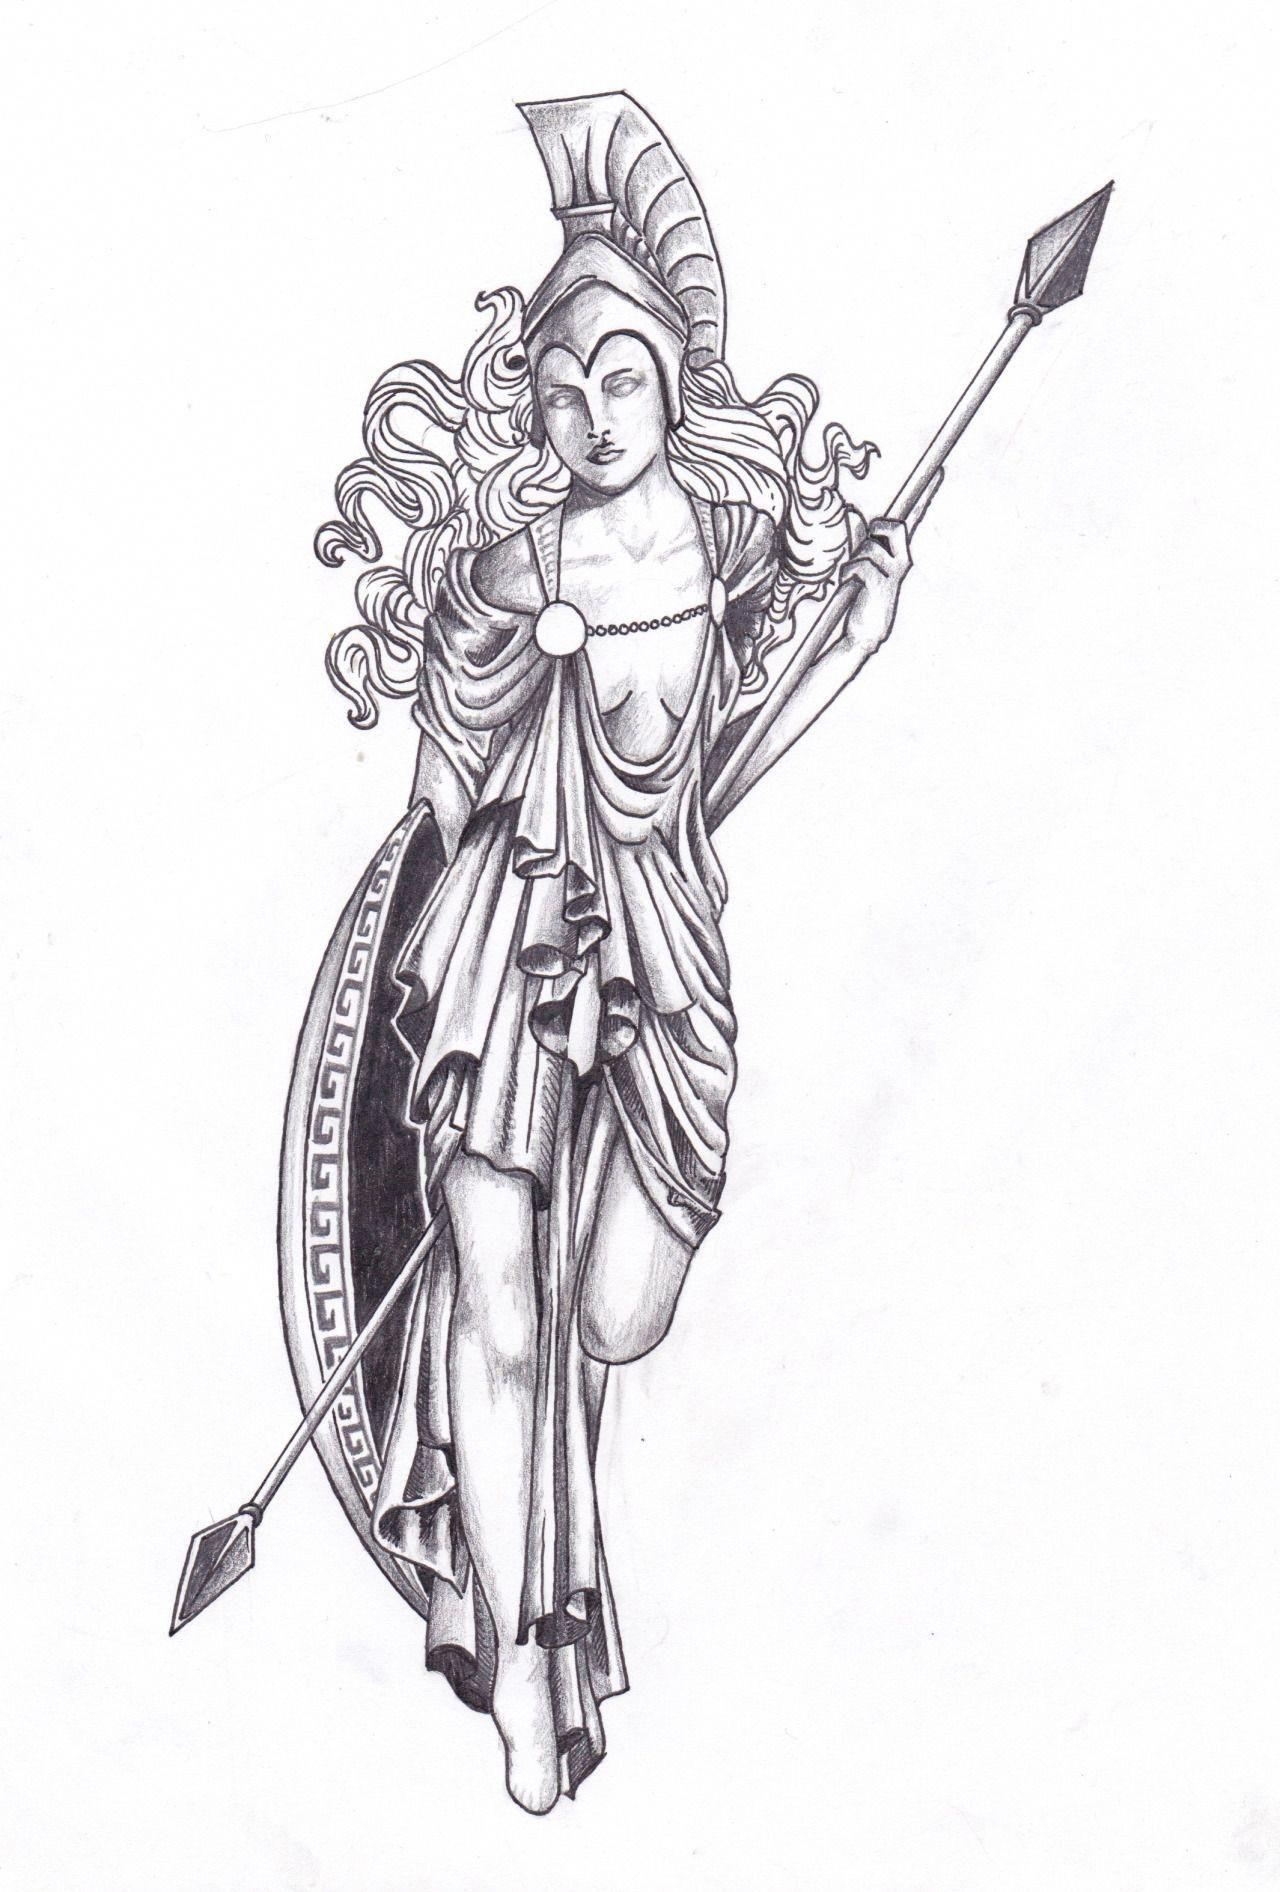 Athena statue tattoo design for a friend. I would love